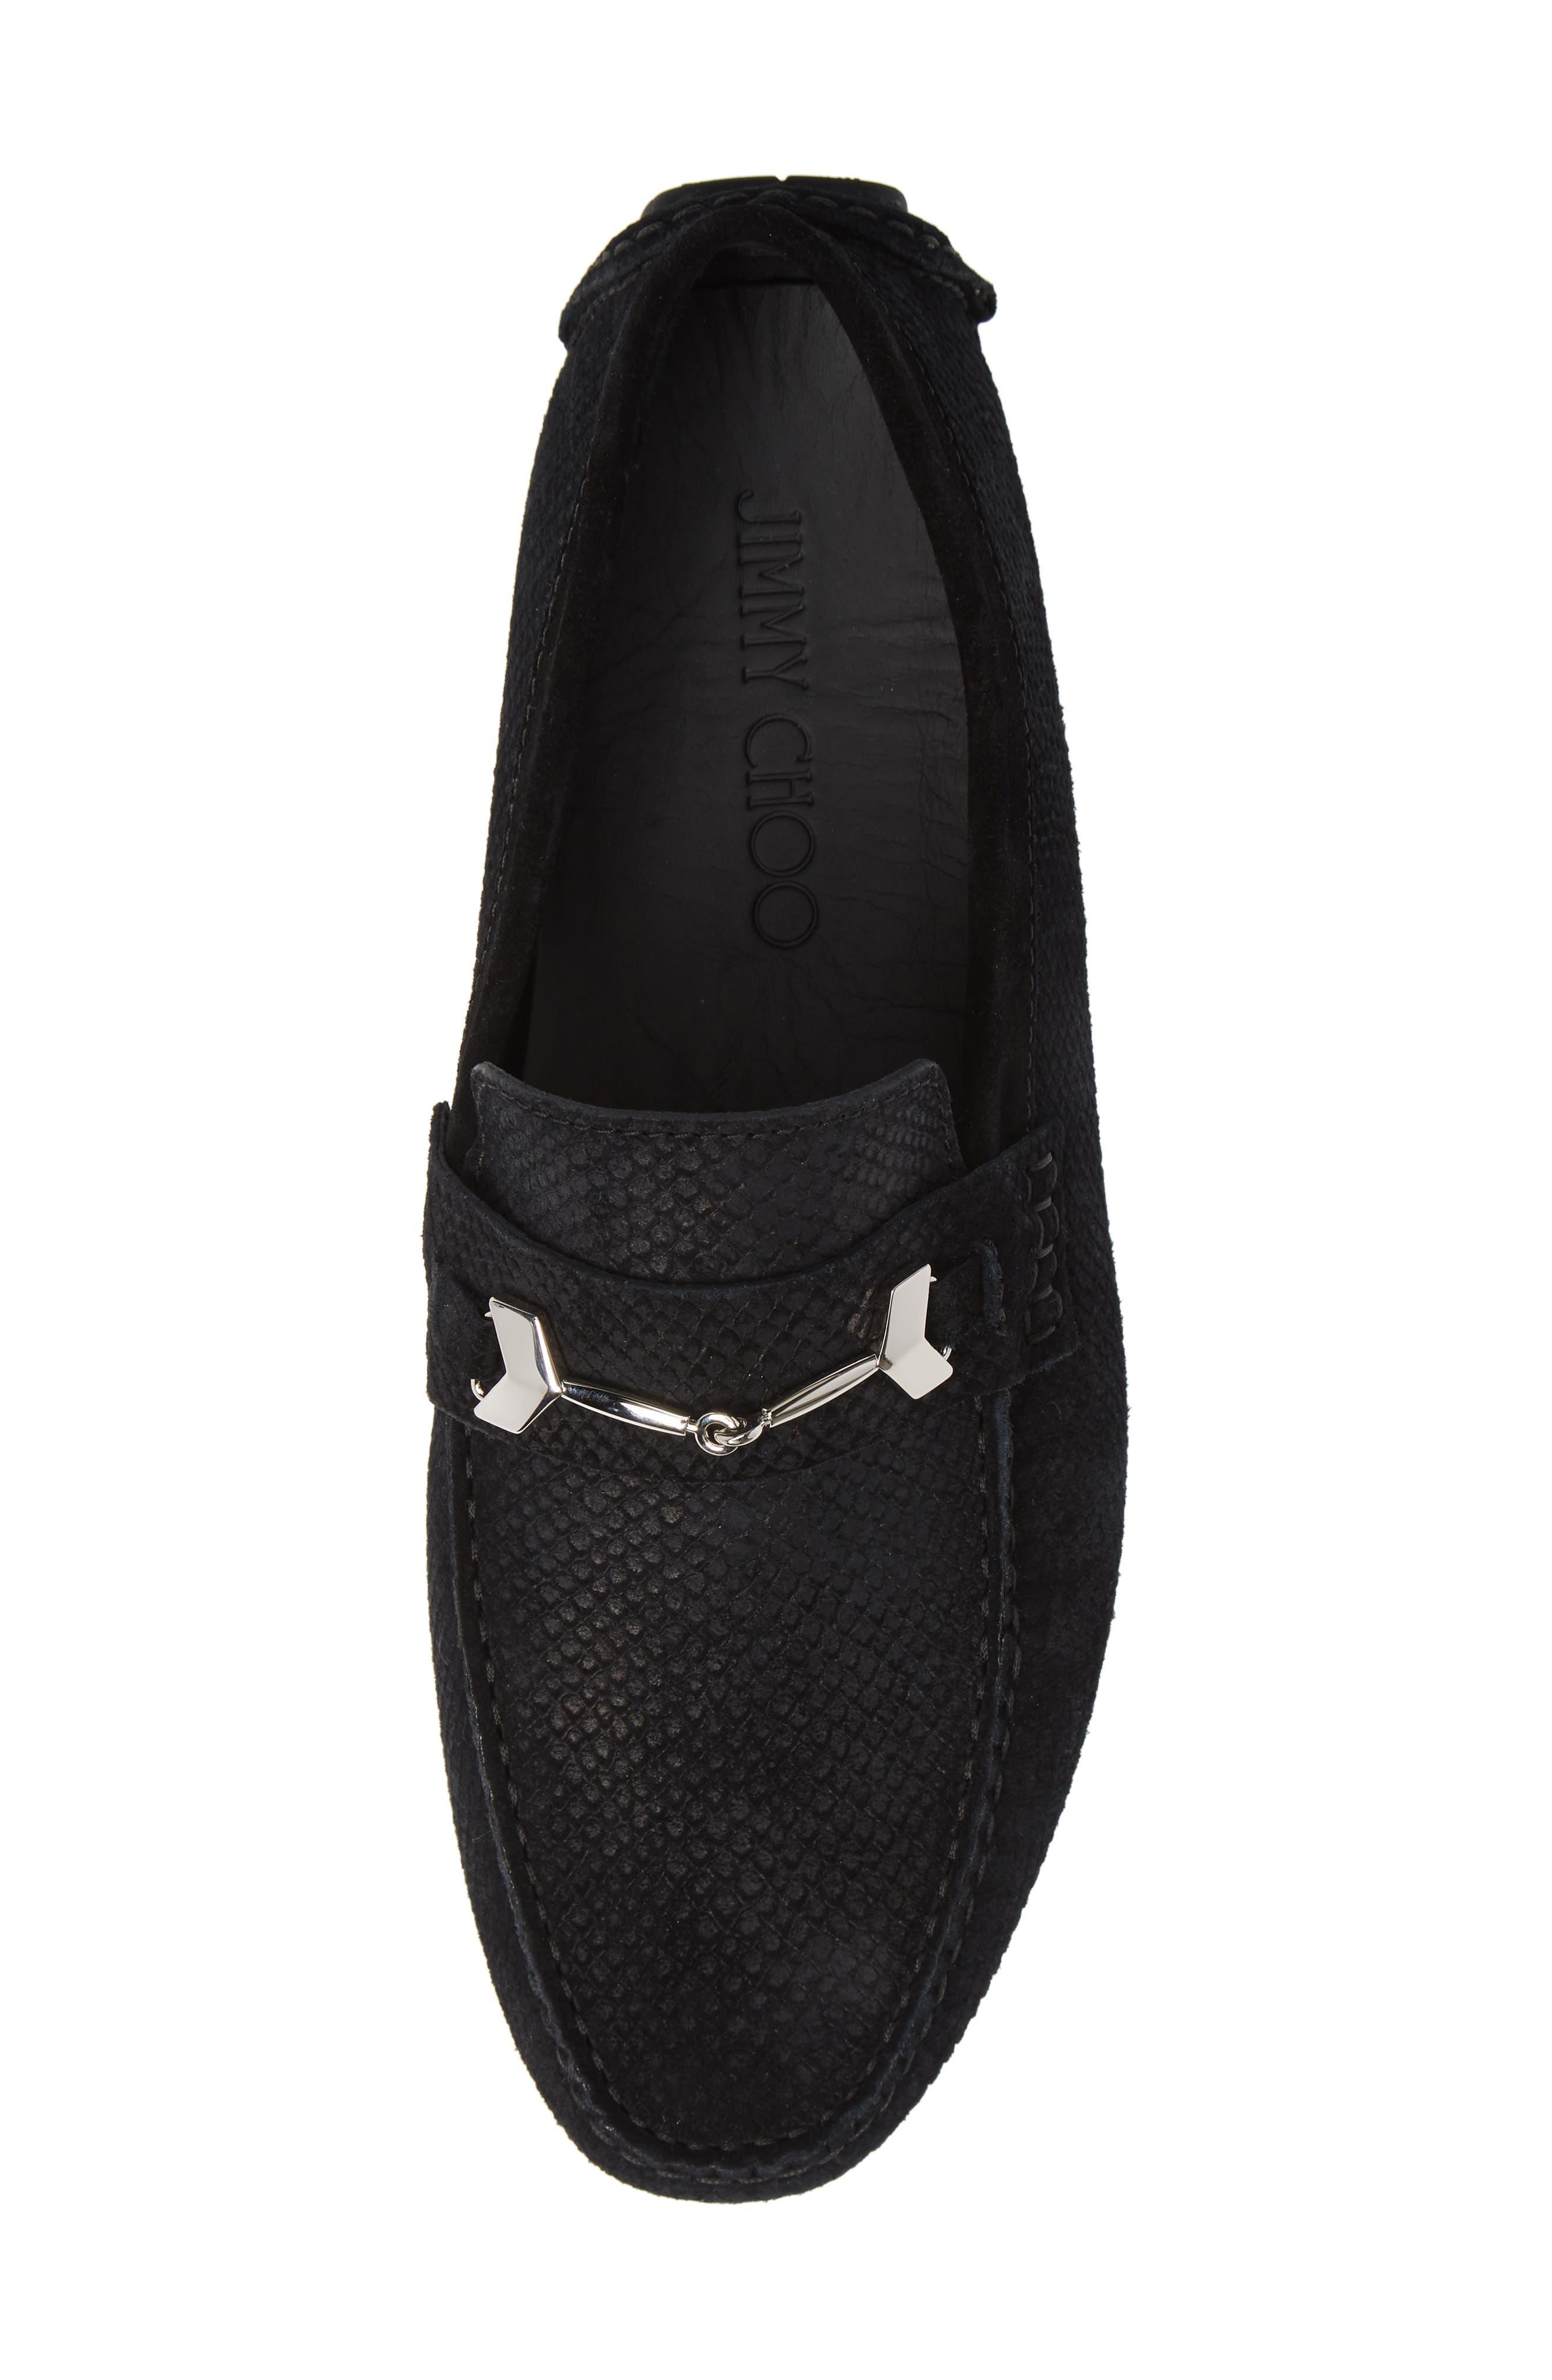 Brewer Croc Textured Driving Loafer,                             Alternate thumbnail 5, color,                             BLACK/BLACK